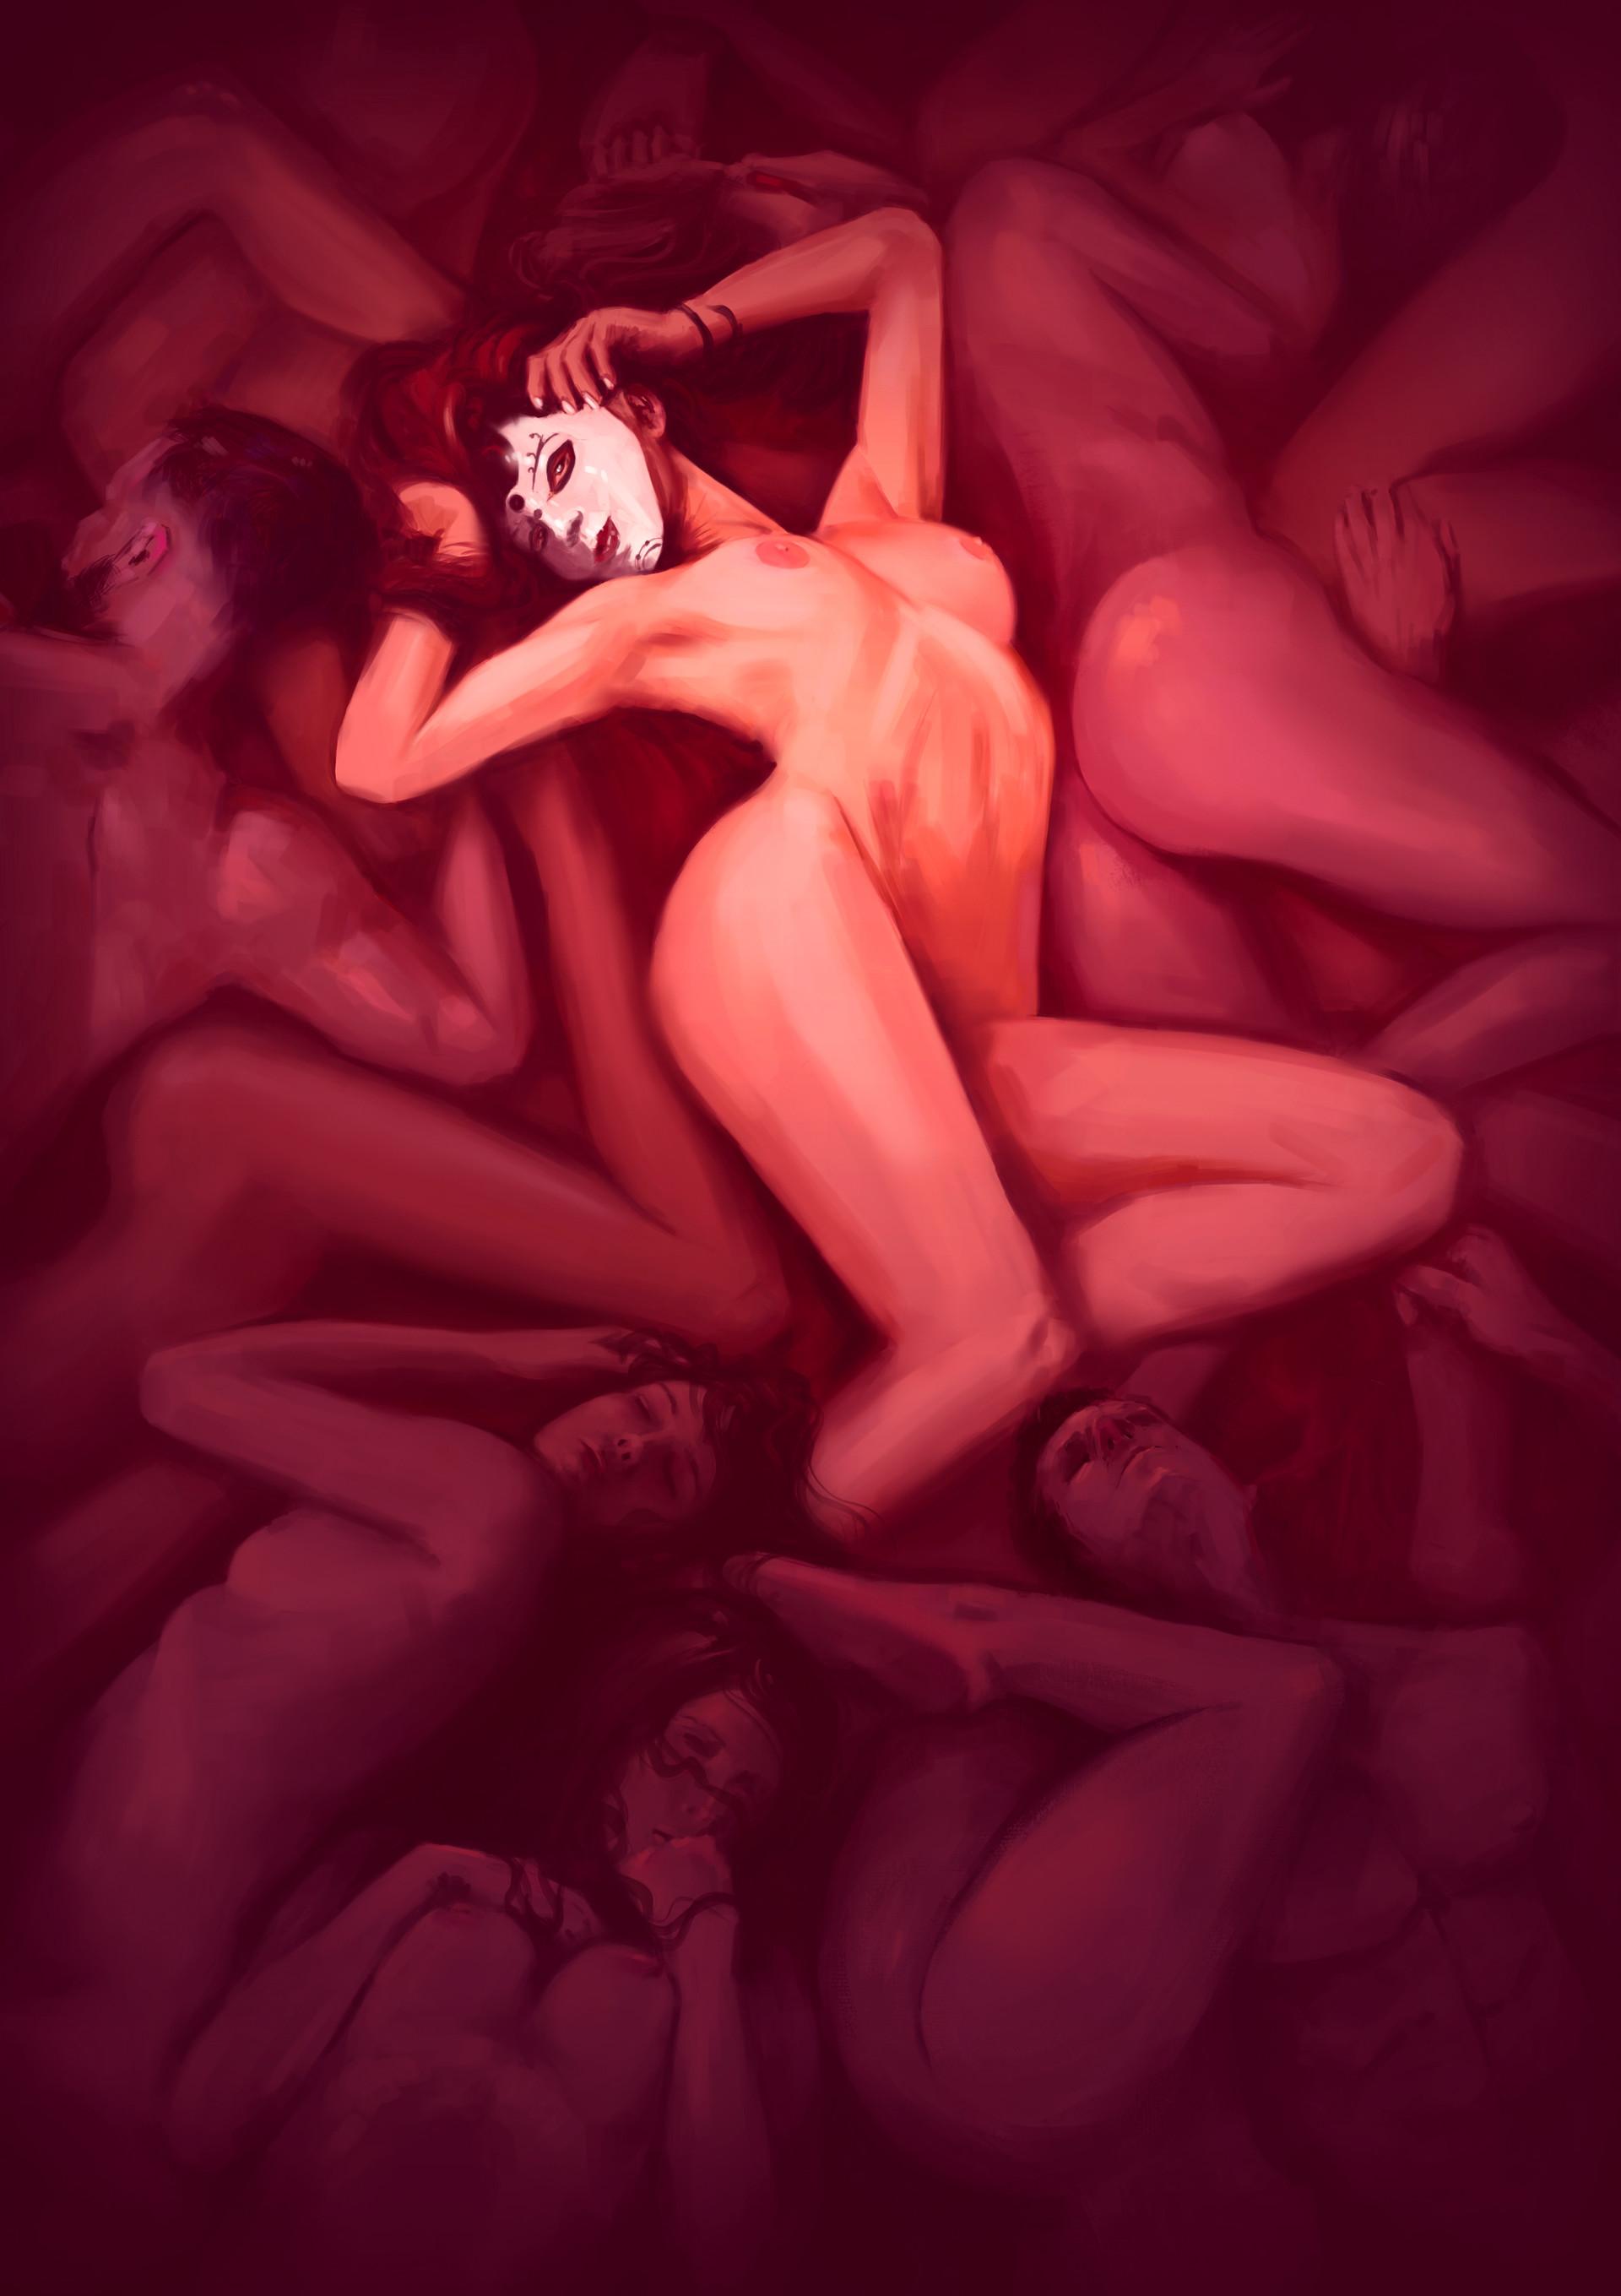 Dawid jurek poster13